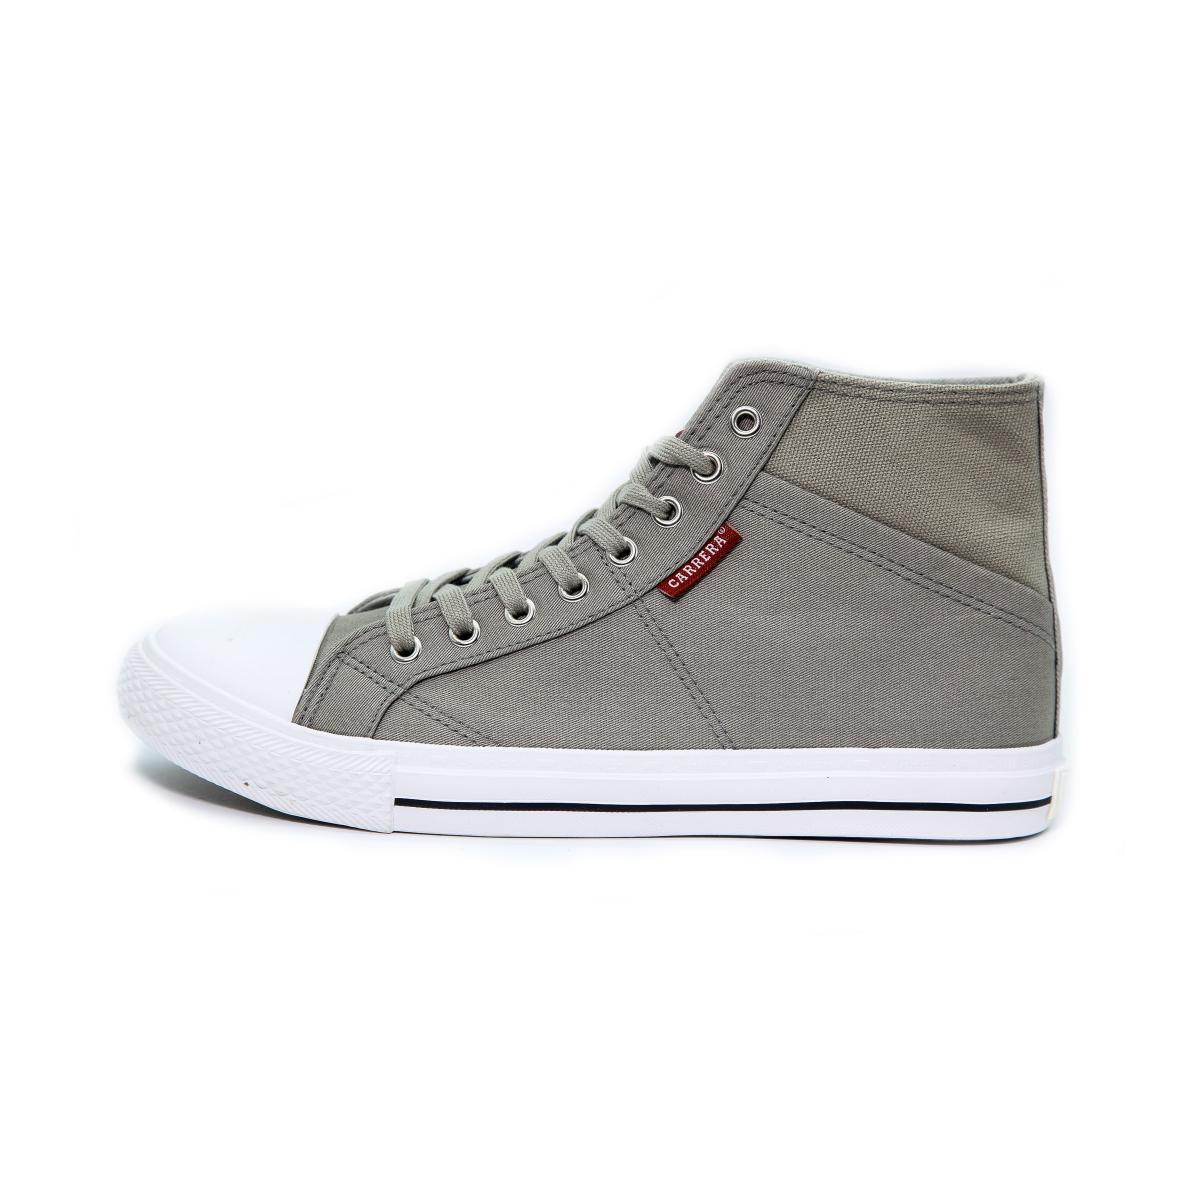 "Scarpe Sneakers ""Carrera"" Alte Da Ginnastica in Tela Grigia da Uomo"